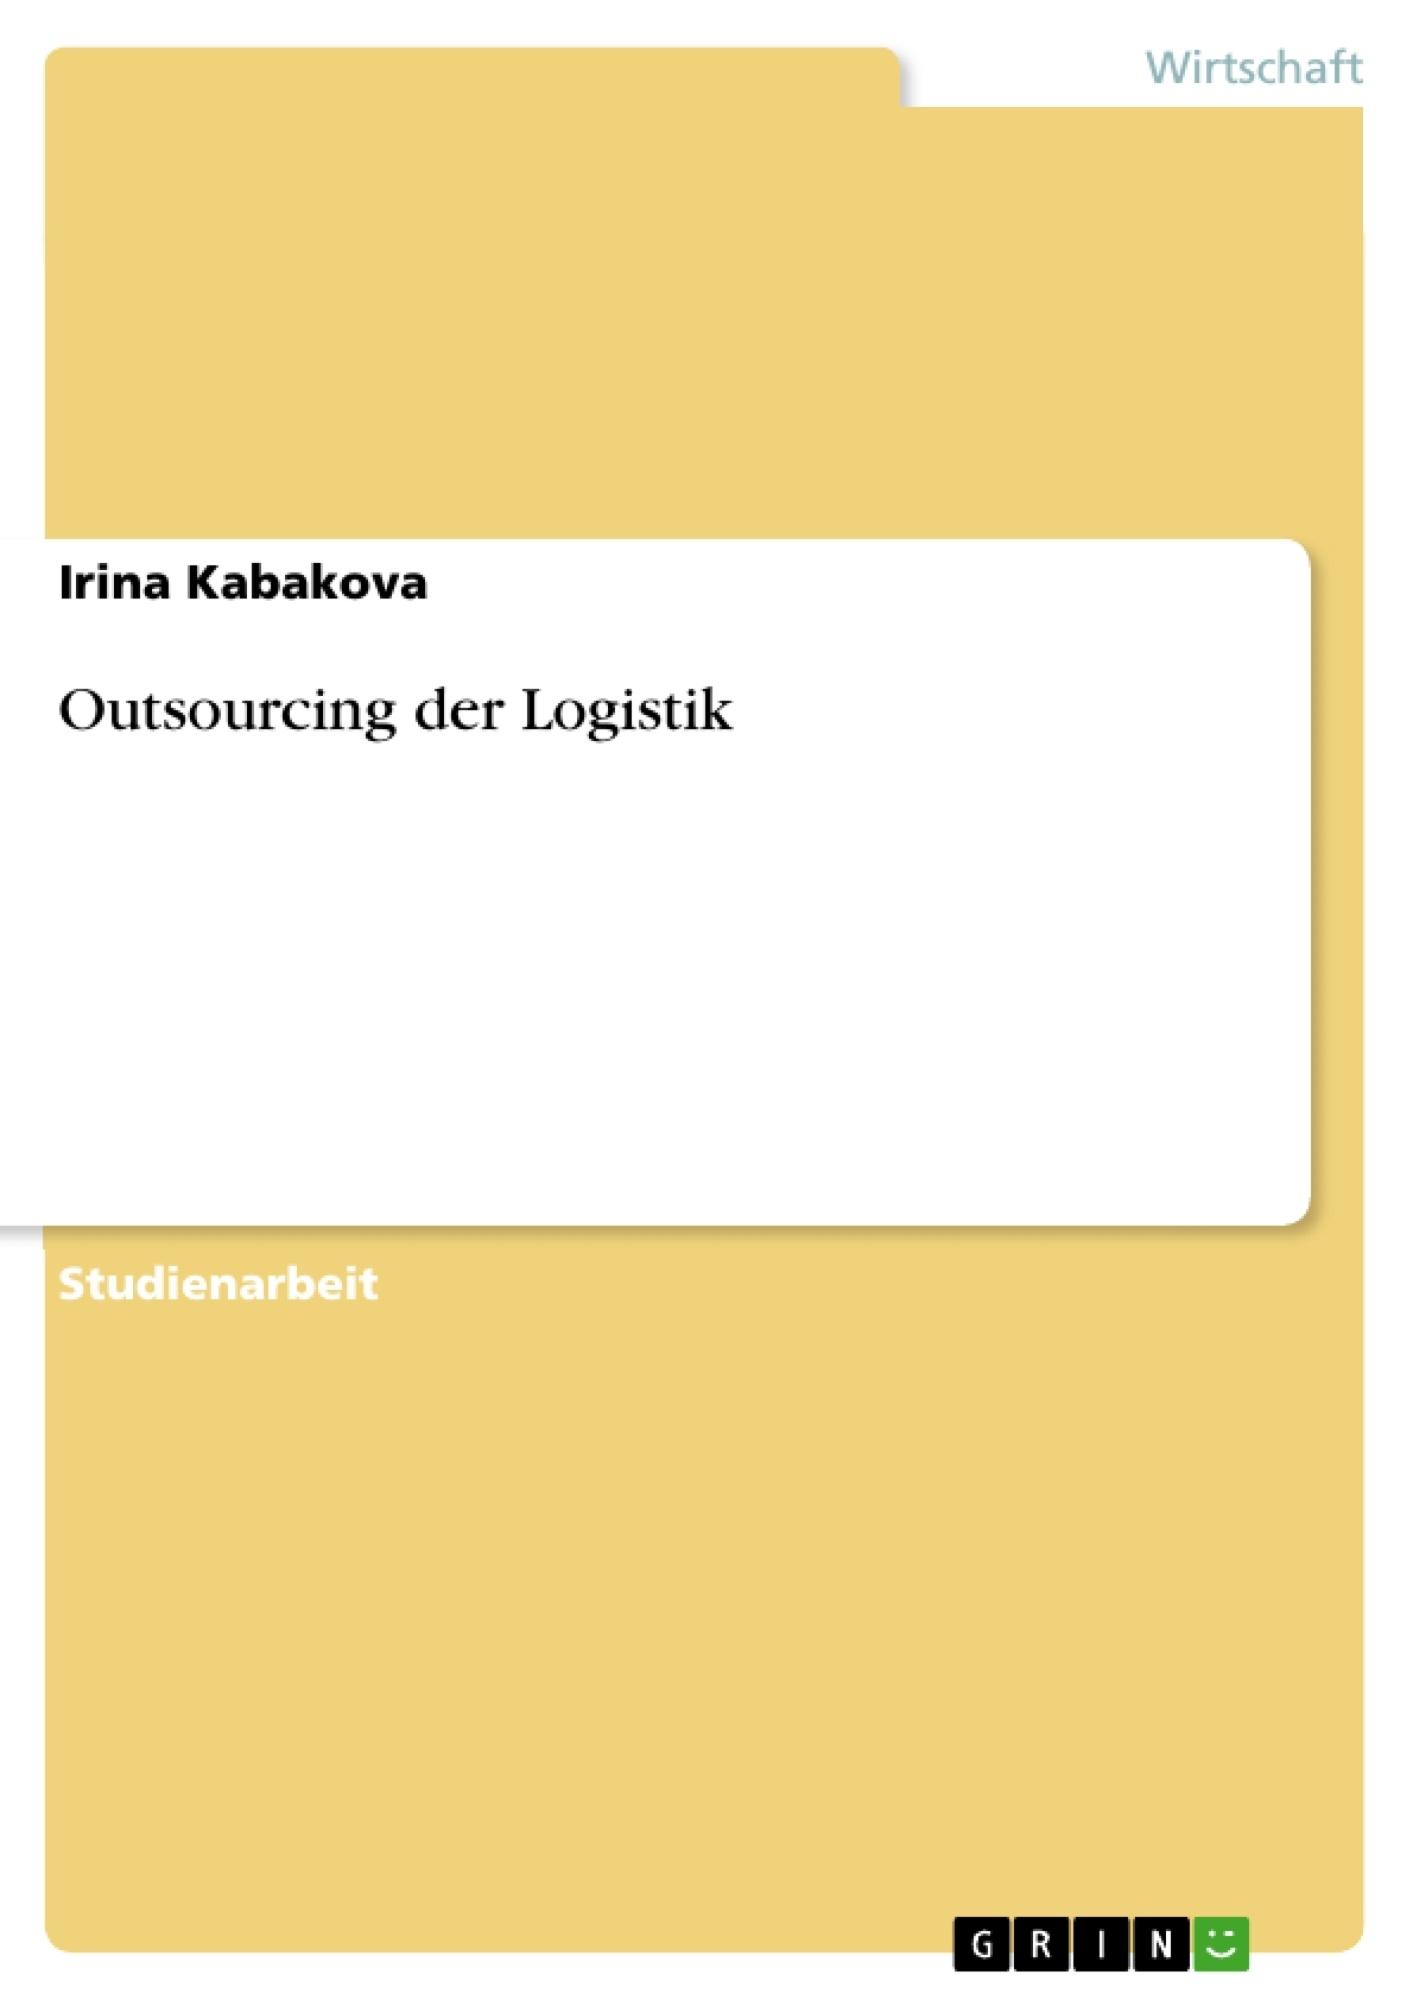 Titel: Outsourcing der Logistik